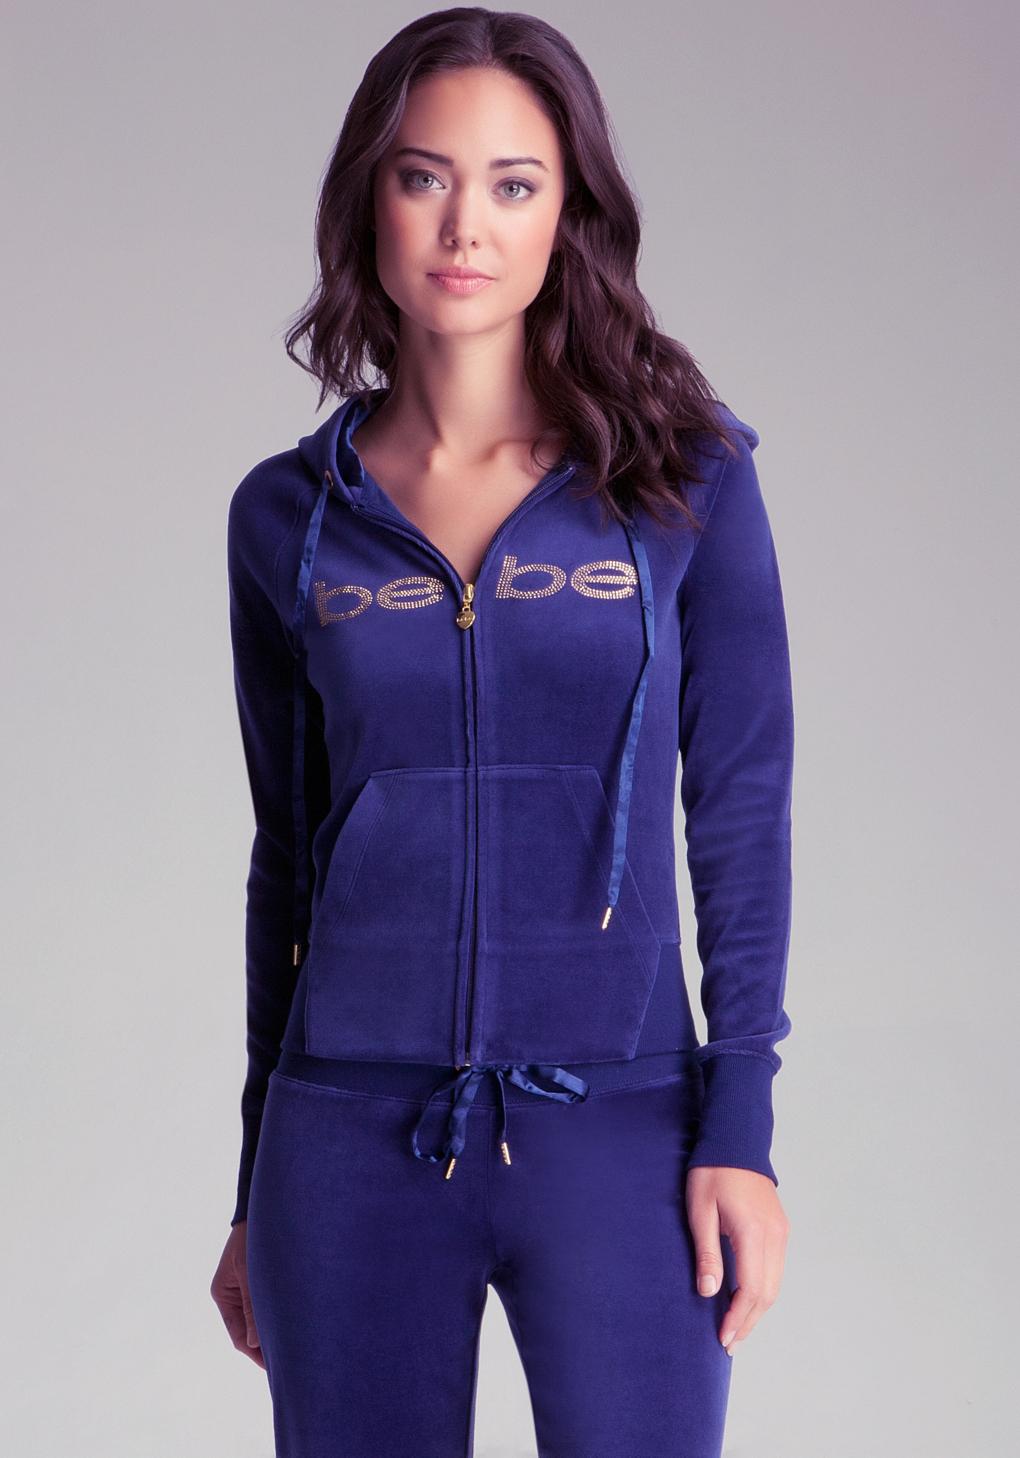 Nordstrom Jeans Women